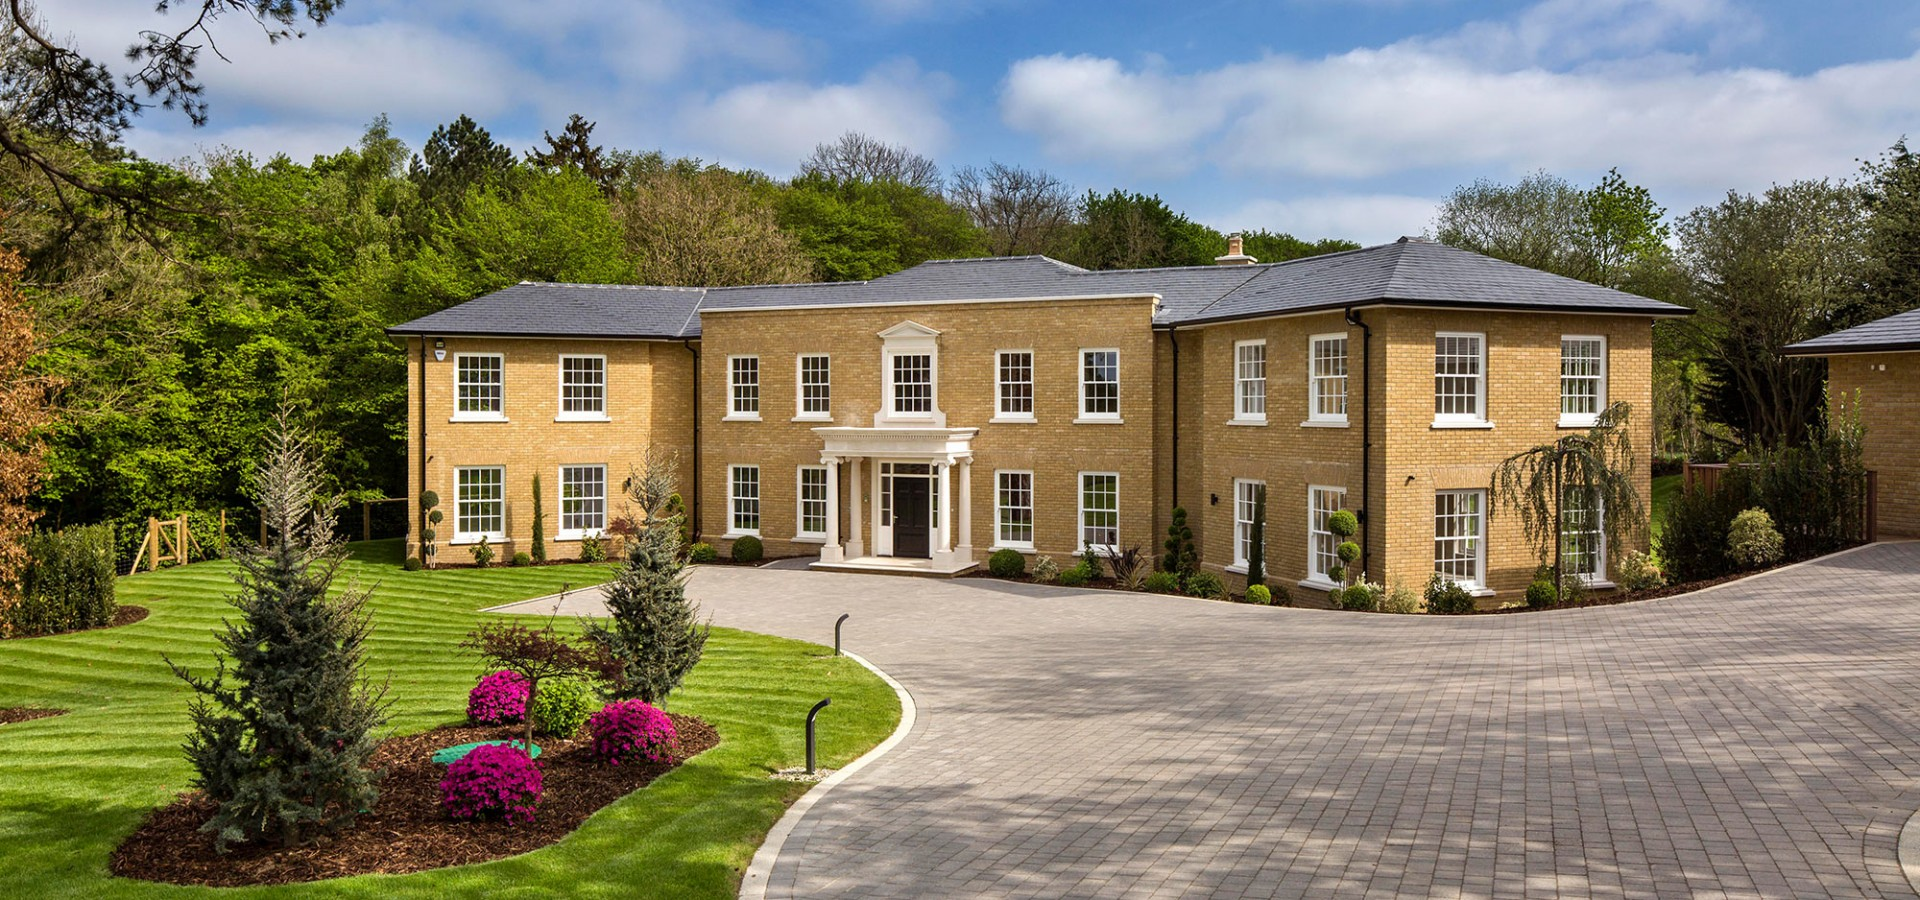 Hertfordshire Haven Now Sold